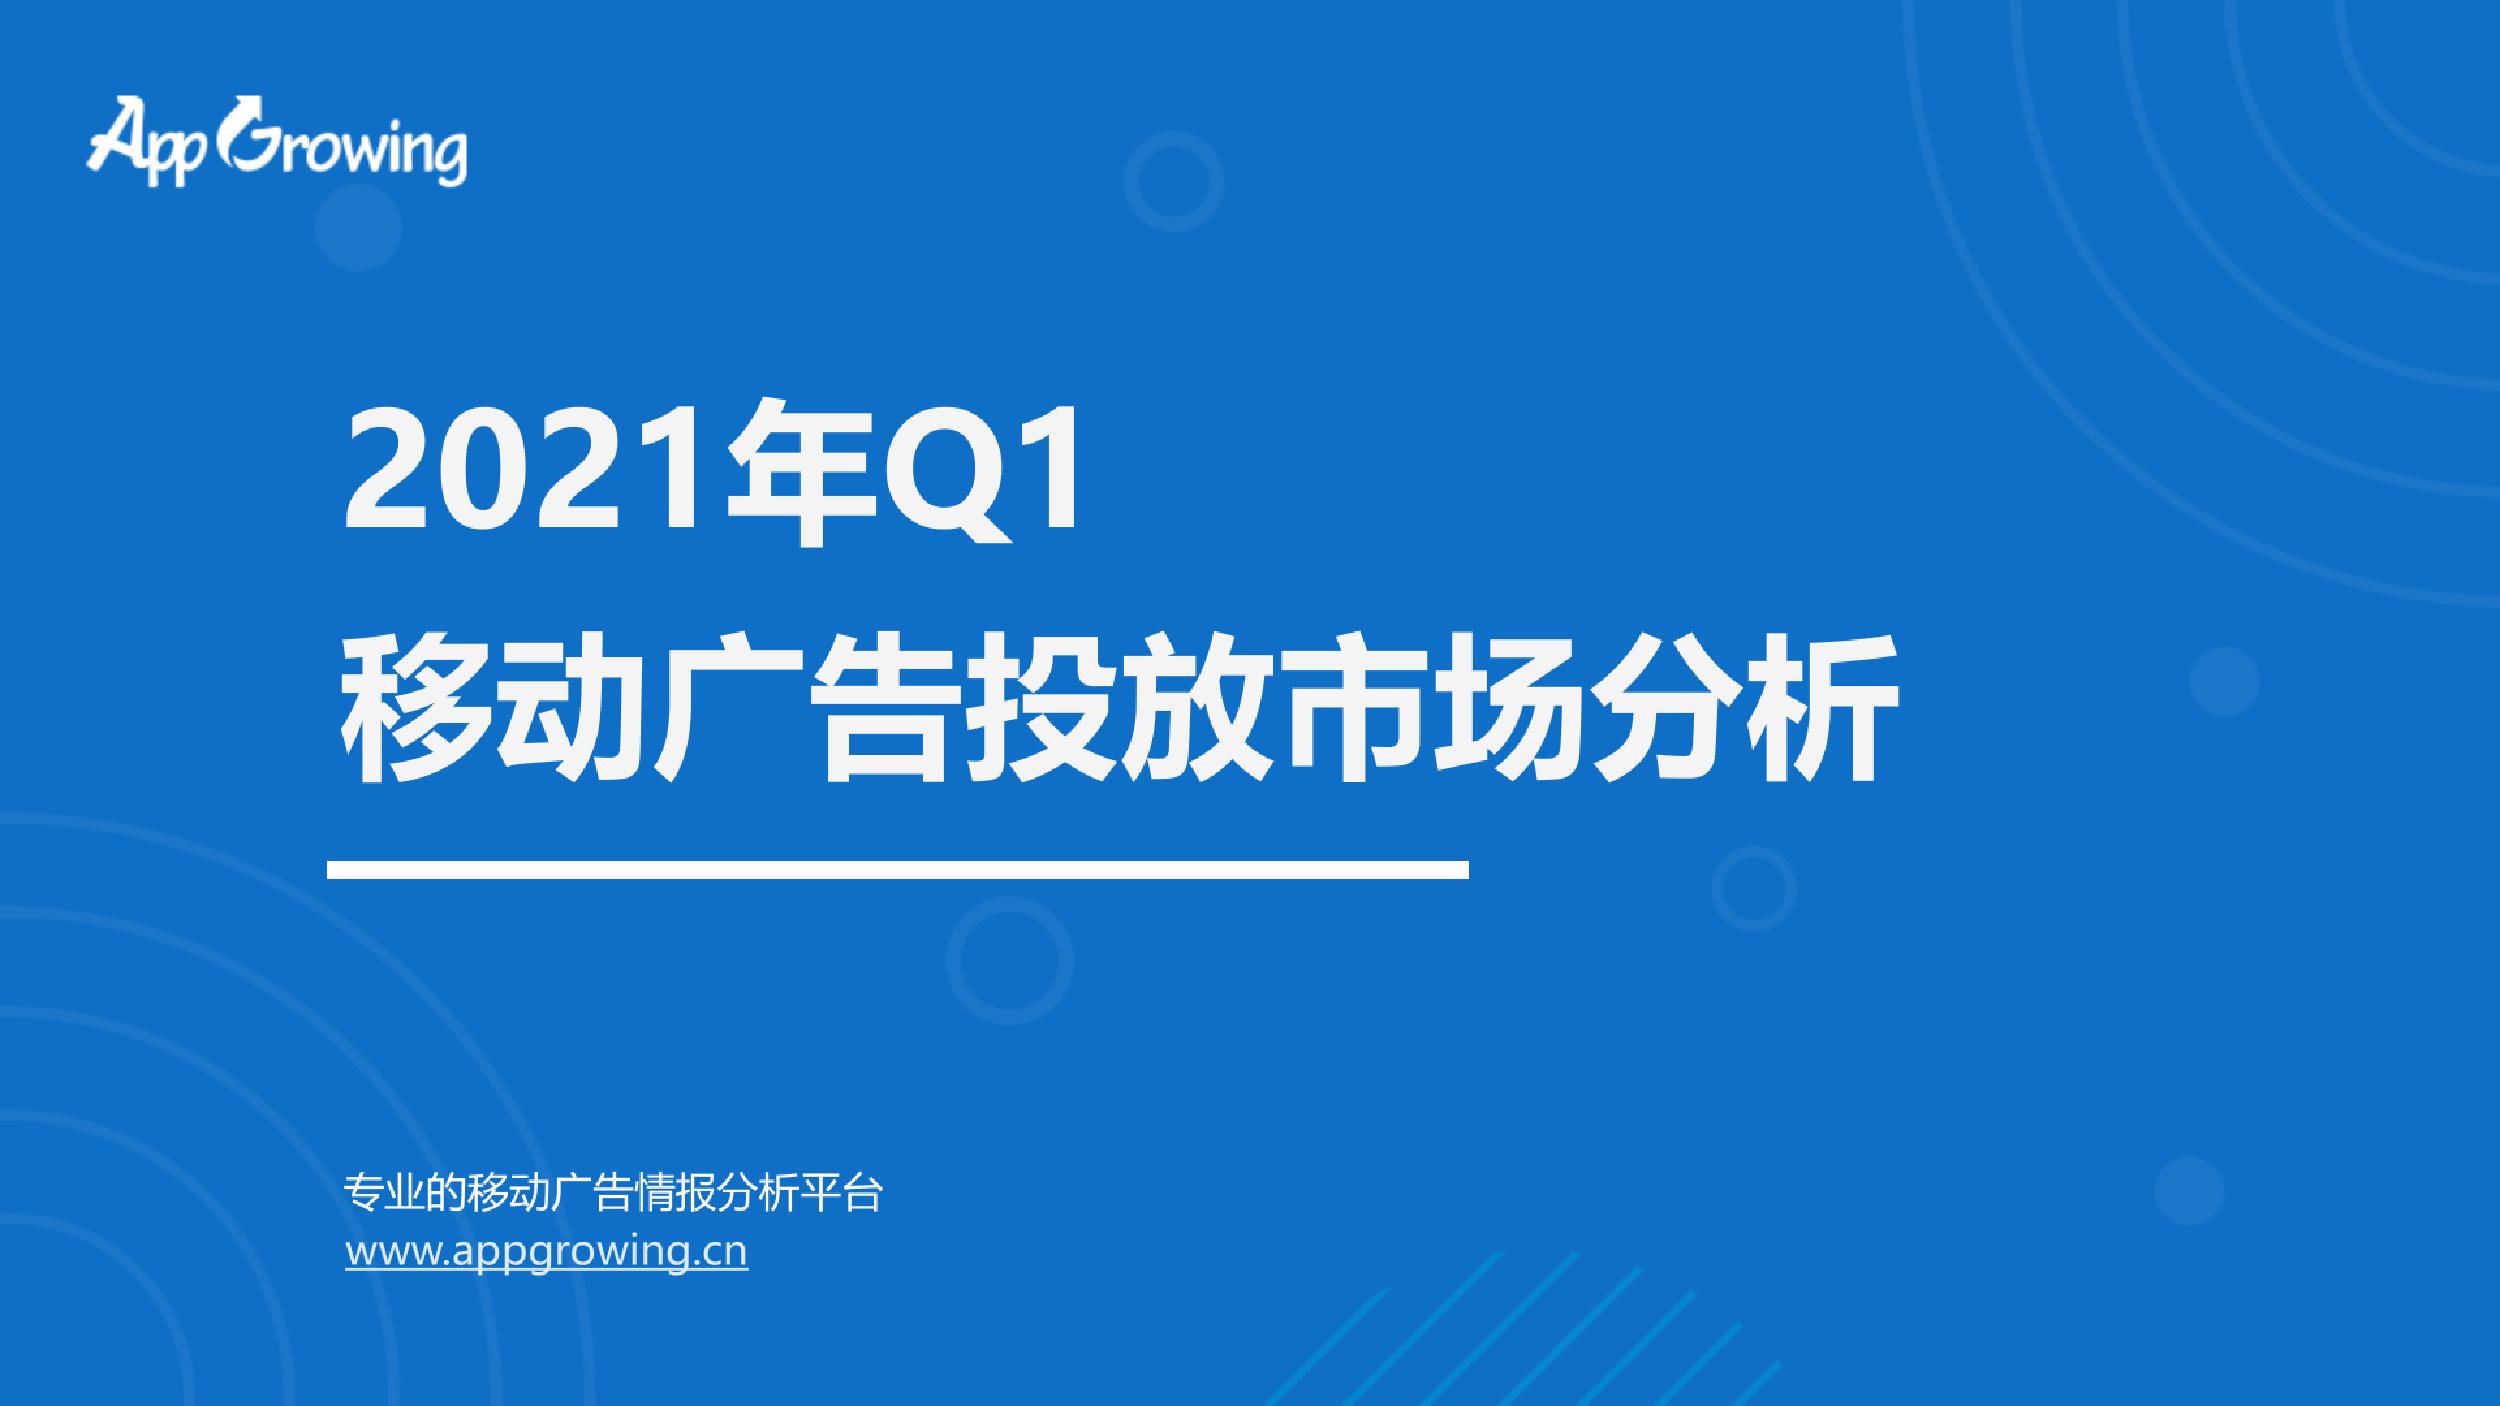 App Growing出品 - 2021年Q1移动广告投放分析报告